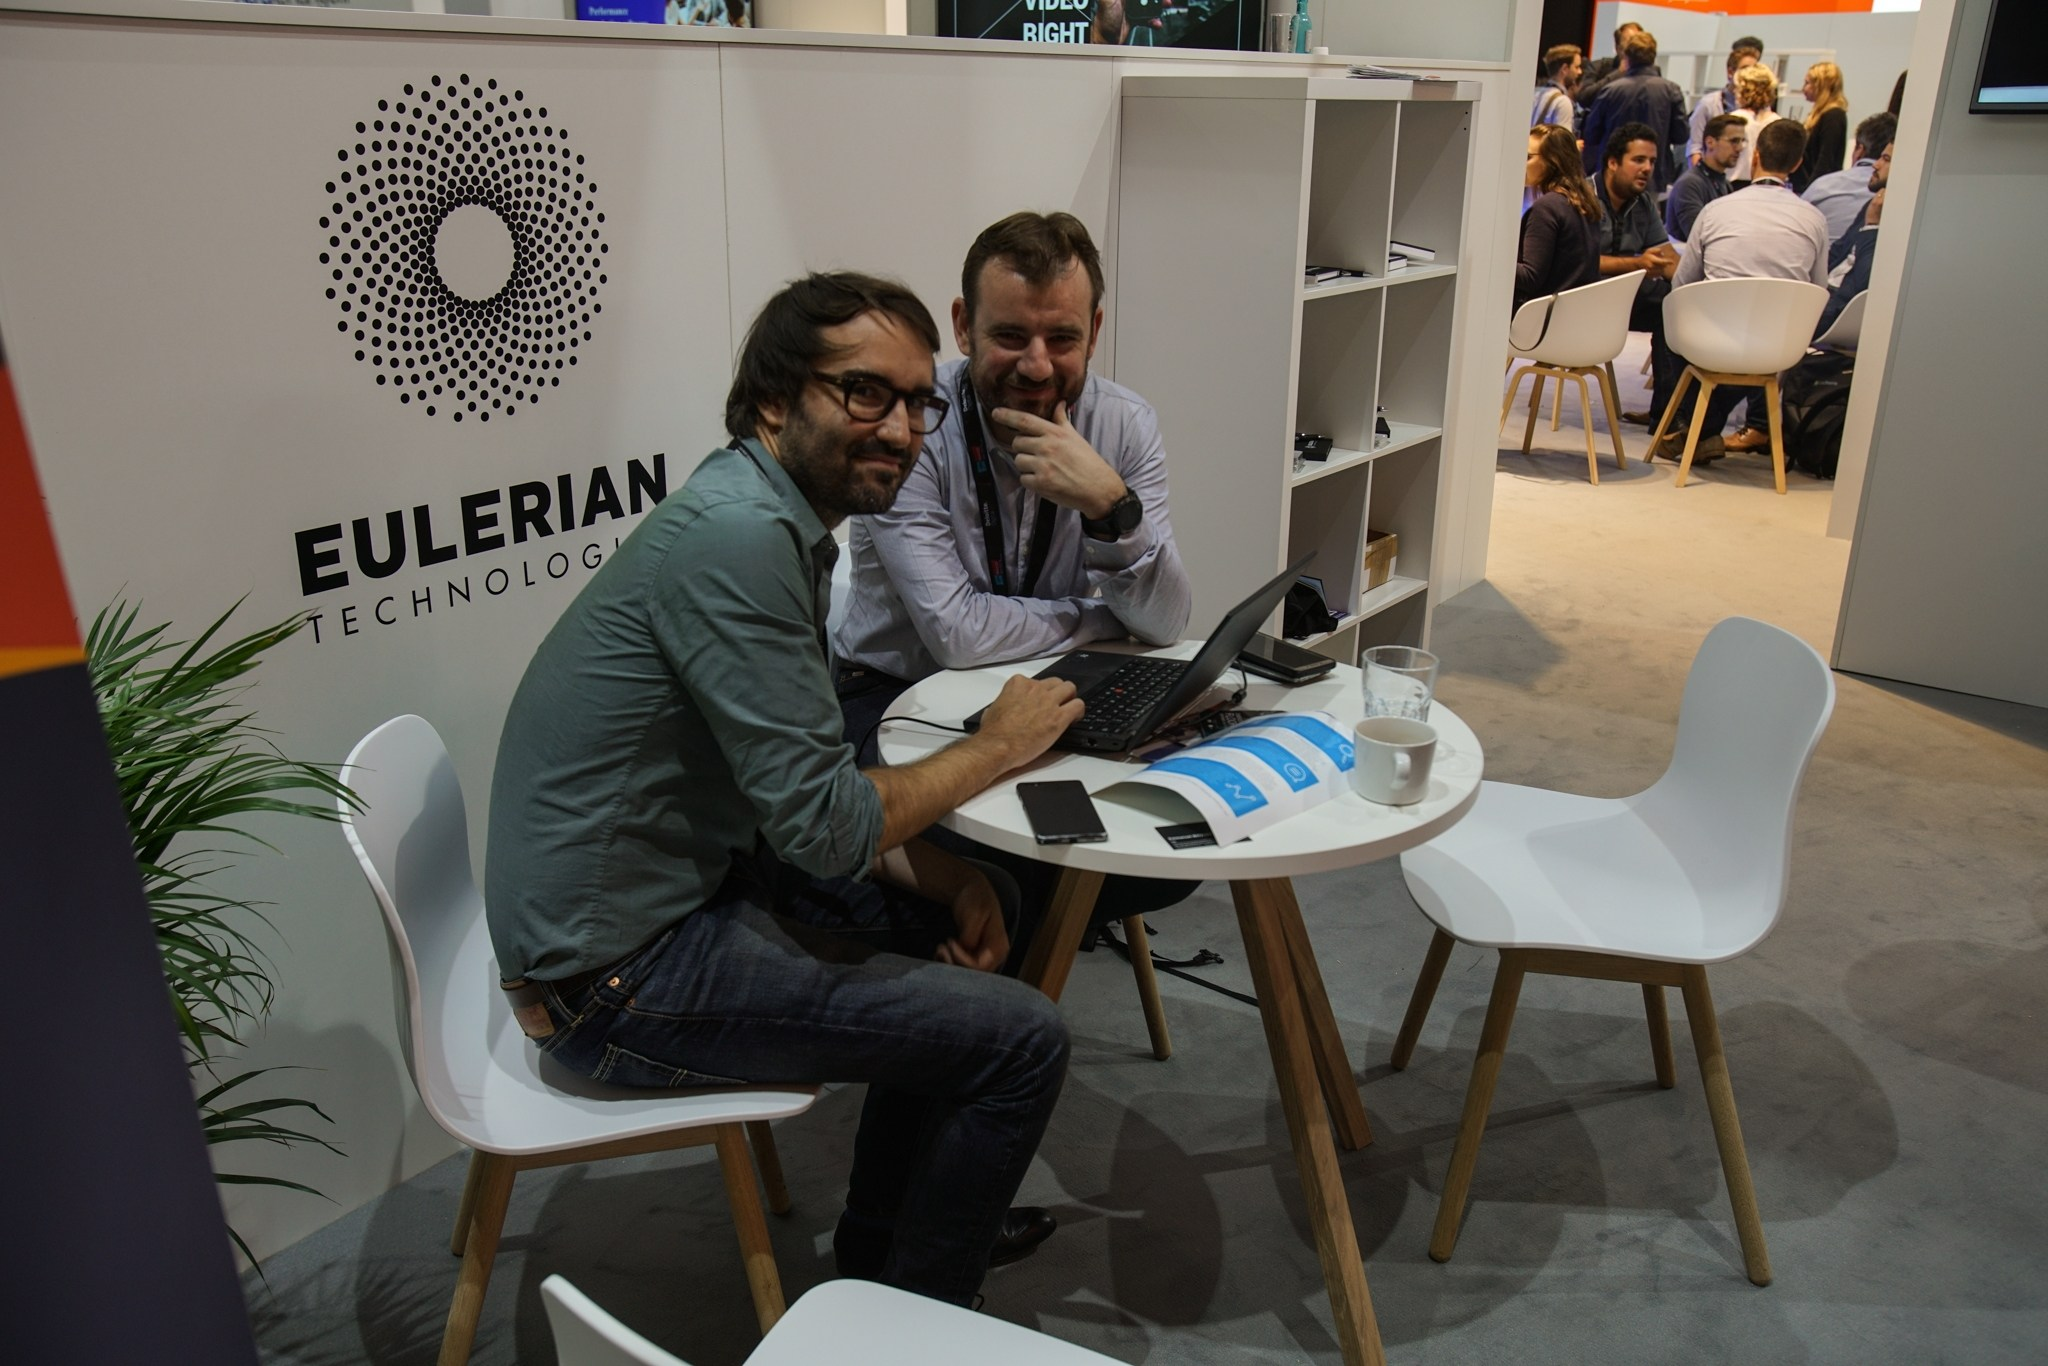 Eulerian Technologies Dmexco 2017